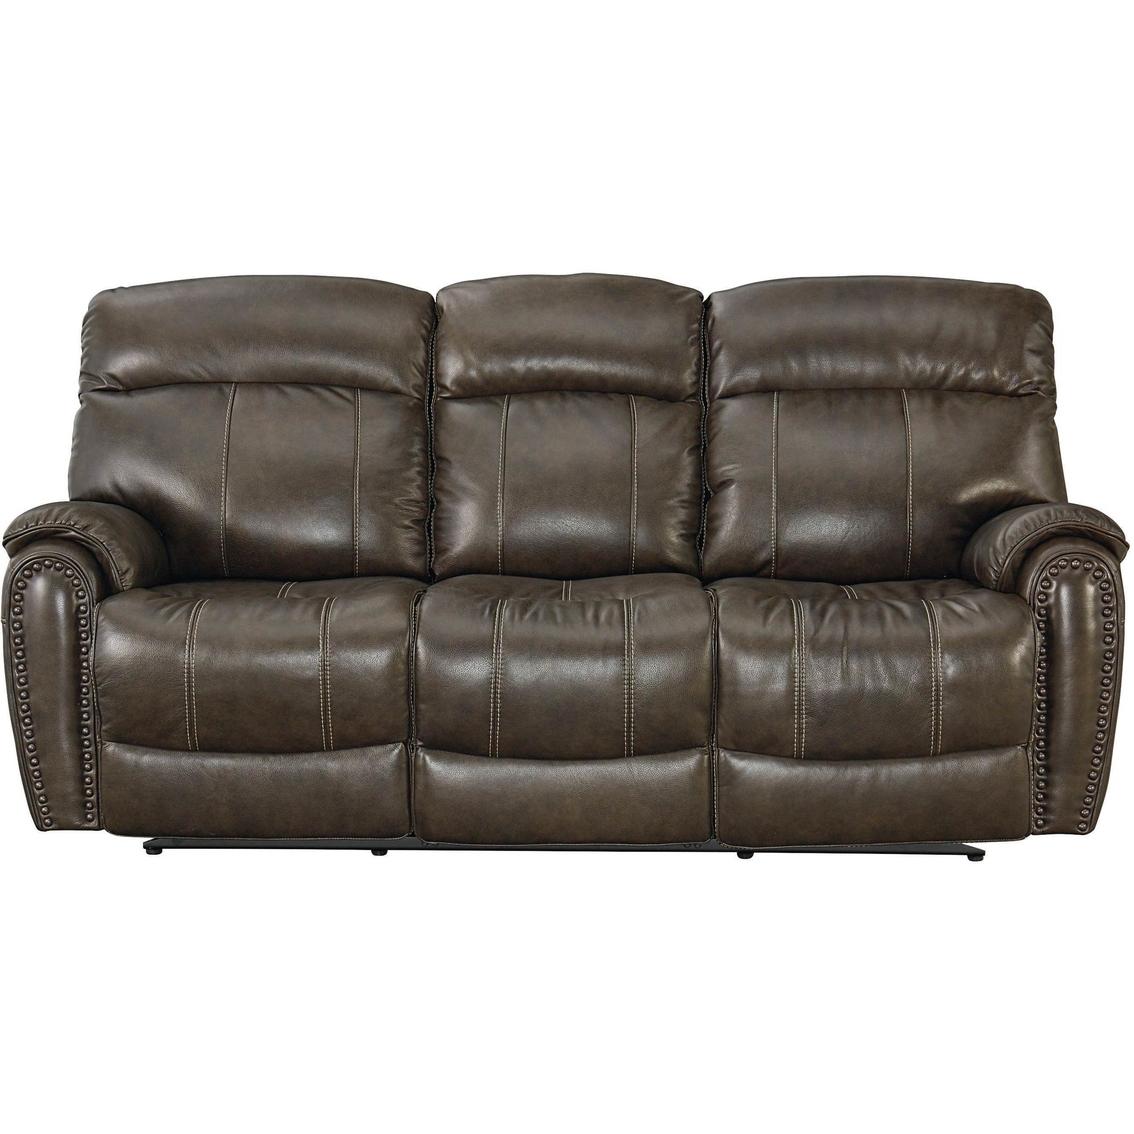 Bassett Club Level Bridgeport Power Reclining Sofa Sofas Couches Furniture Appliances Shop The Exchange